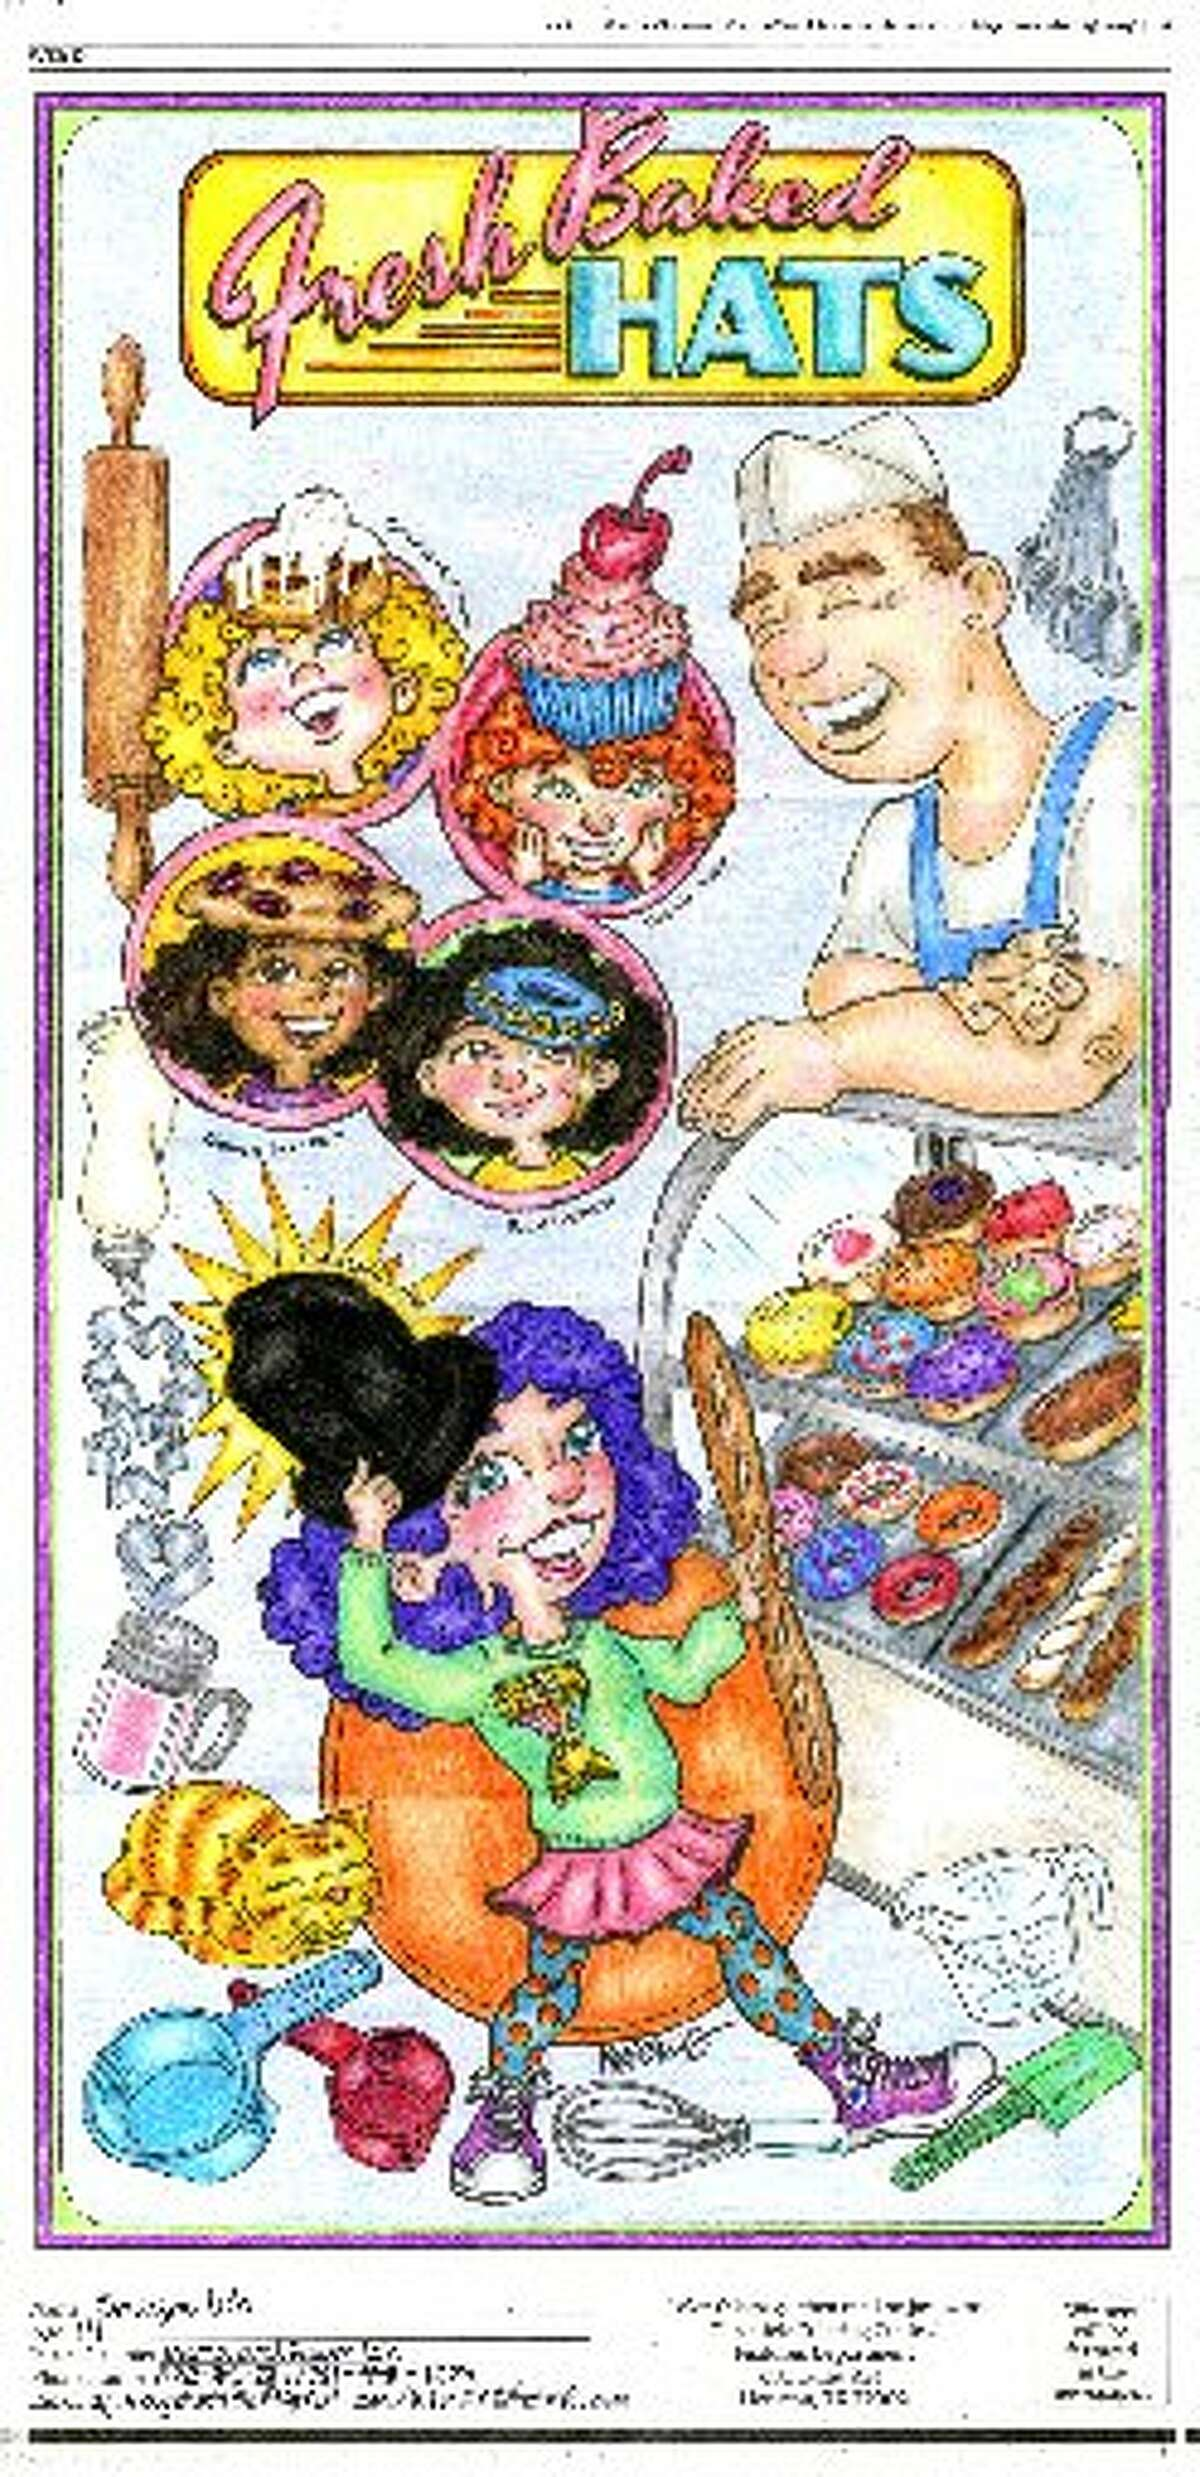 Shayne Loh, age 14, coloring contest winner